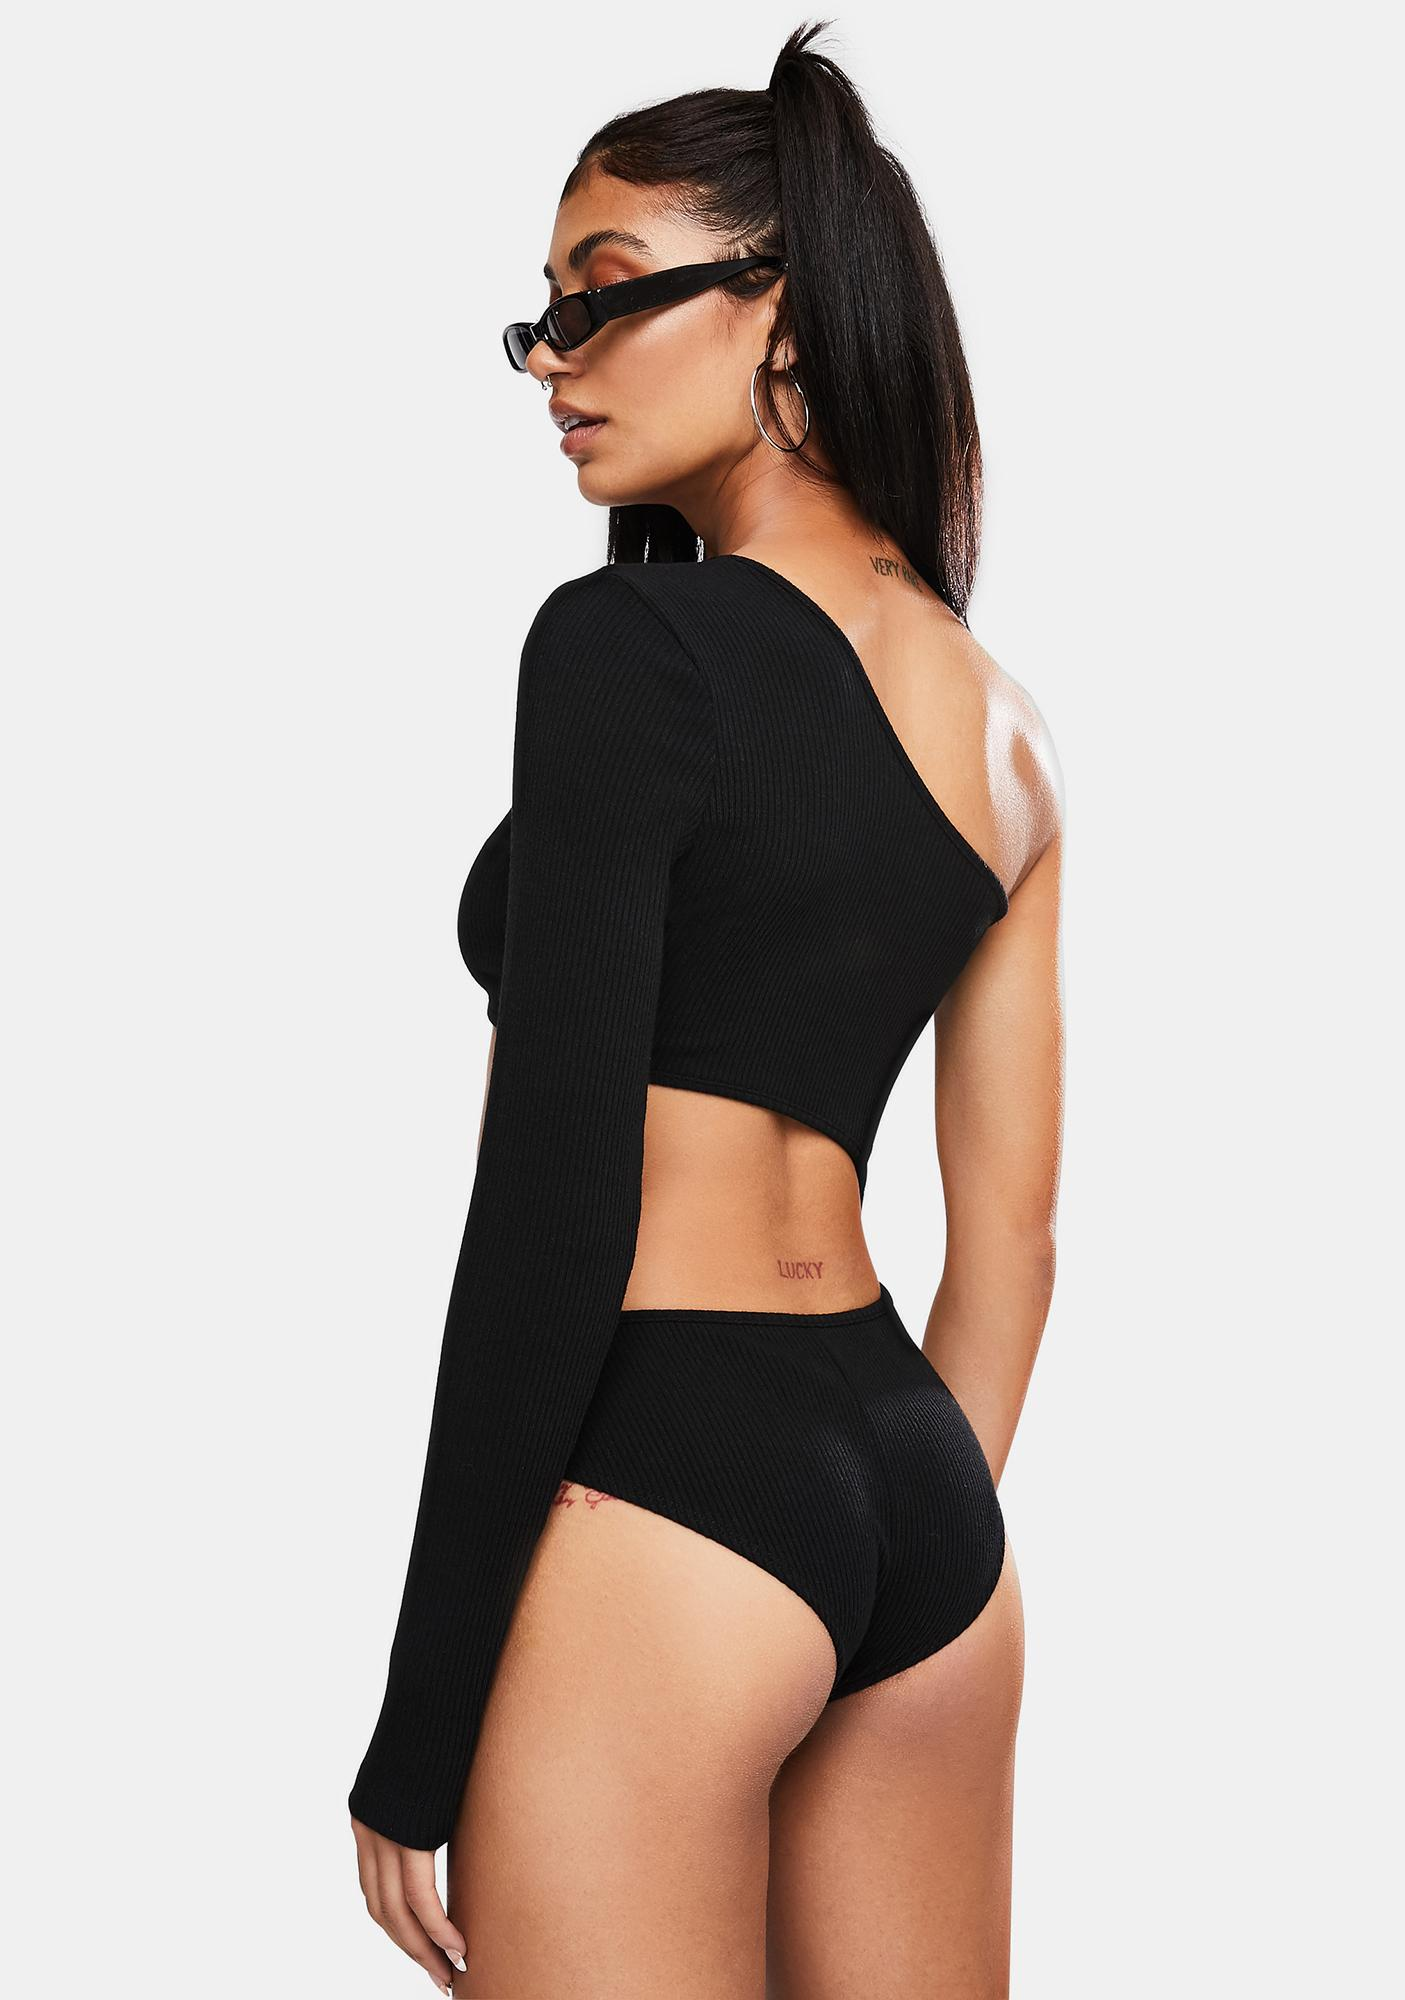 Kiki Riki Vain Af Asymmetrical Bodysuit